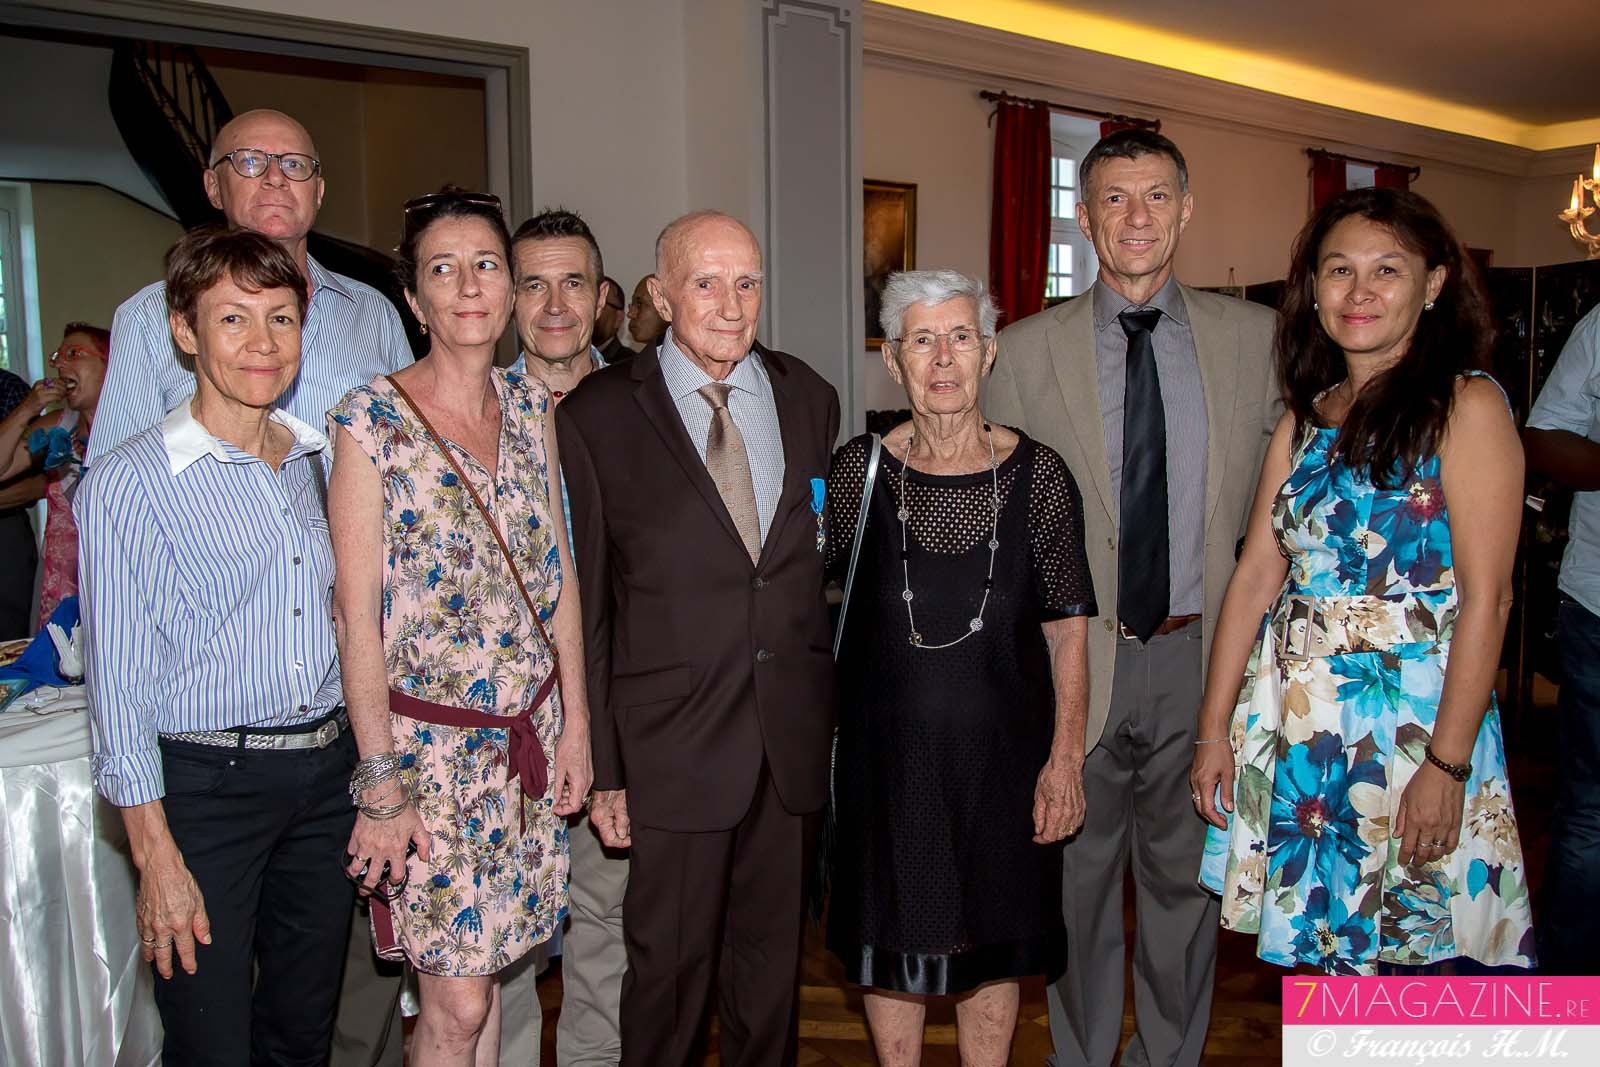 Photo de famille: Colette et Pierre-Yves Versini, Alexandra Versini et Philippe Barbier, Paul et Maryvonne Versini, Dominique et Sonia Versini